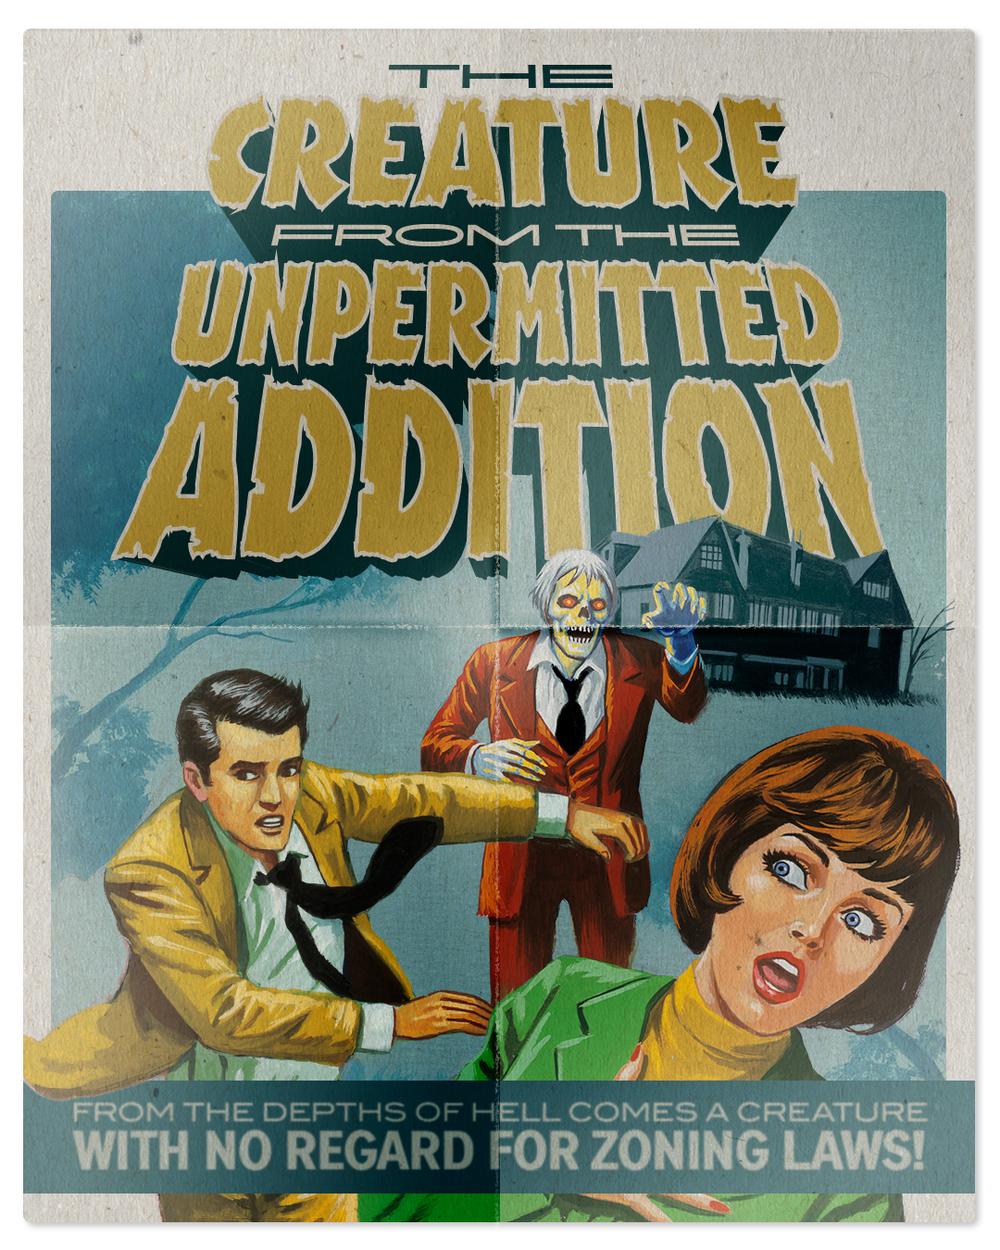 Blockbuster_Creature_Animation_V2b.png